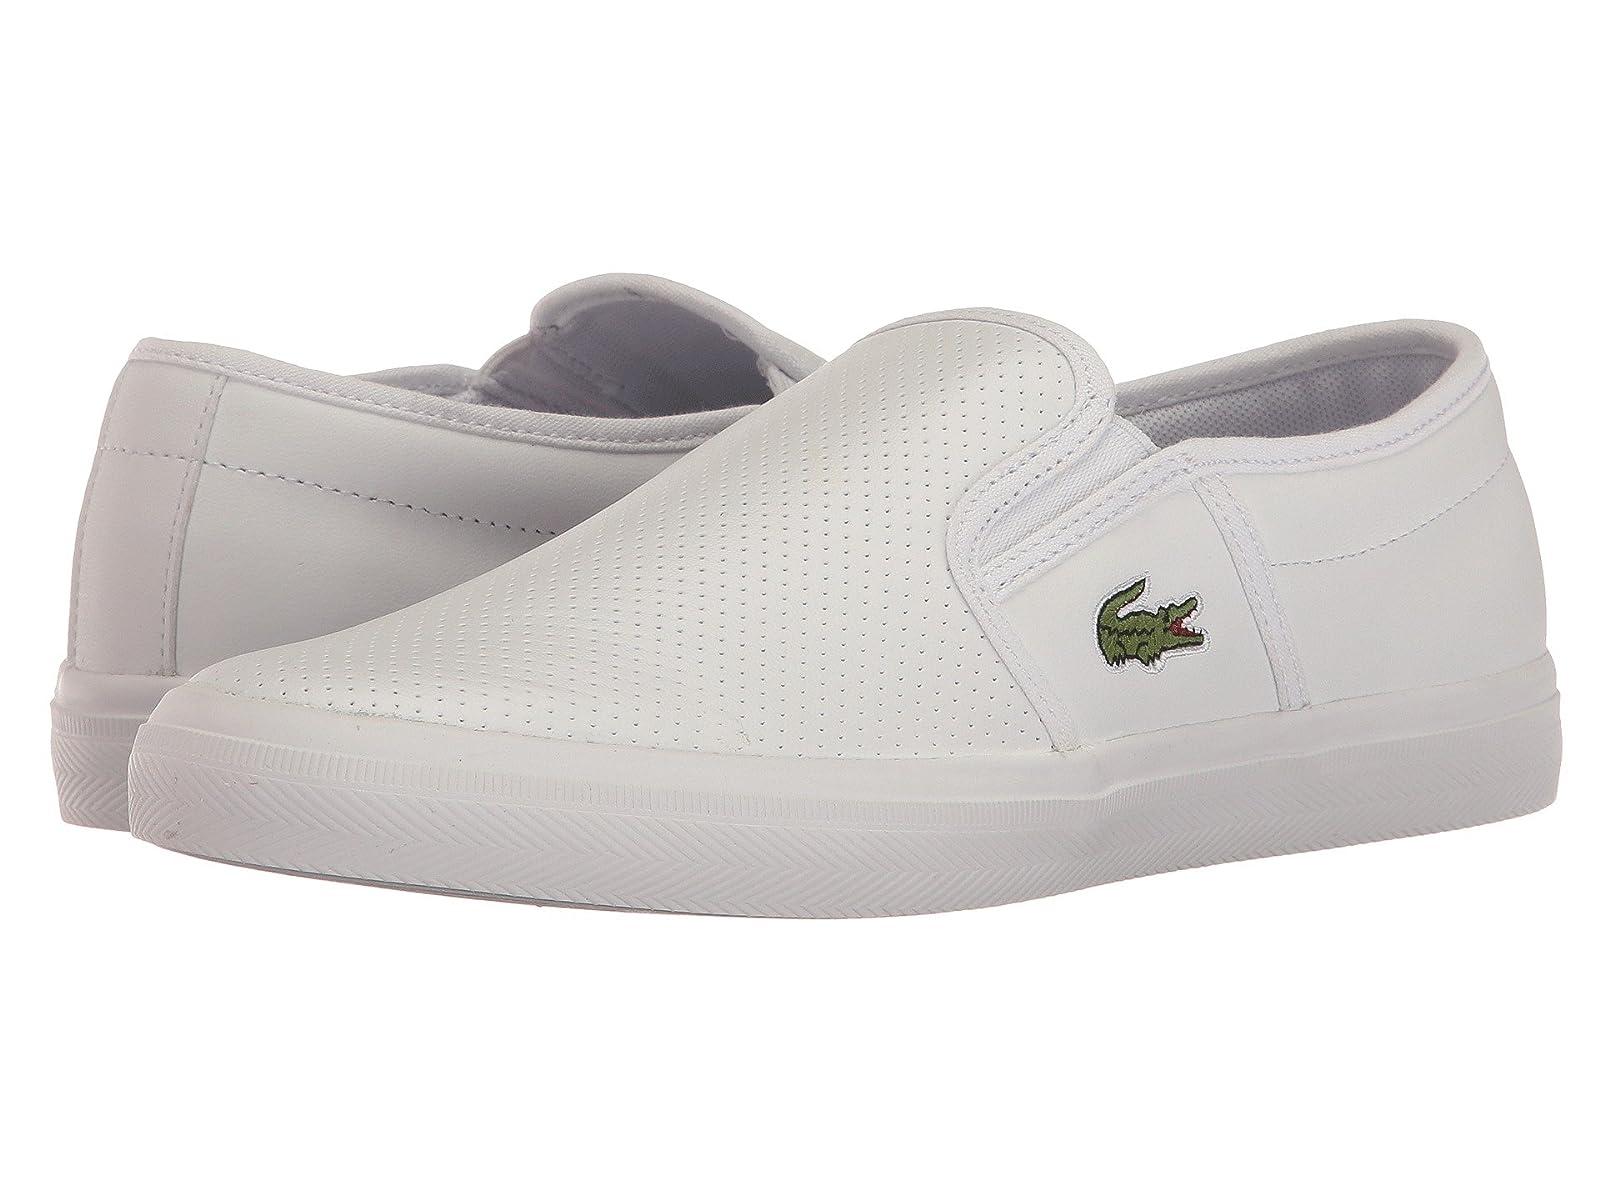 Lacoste Gazon BL 1 CamAtmospheric grades have affordable shoes